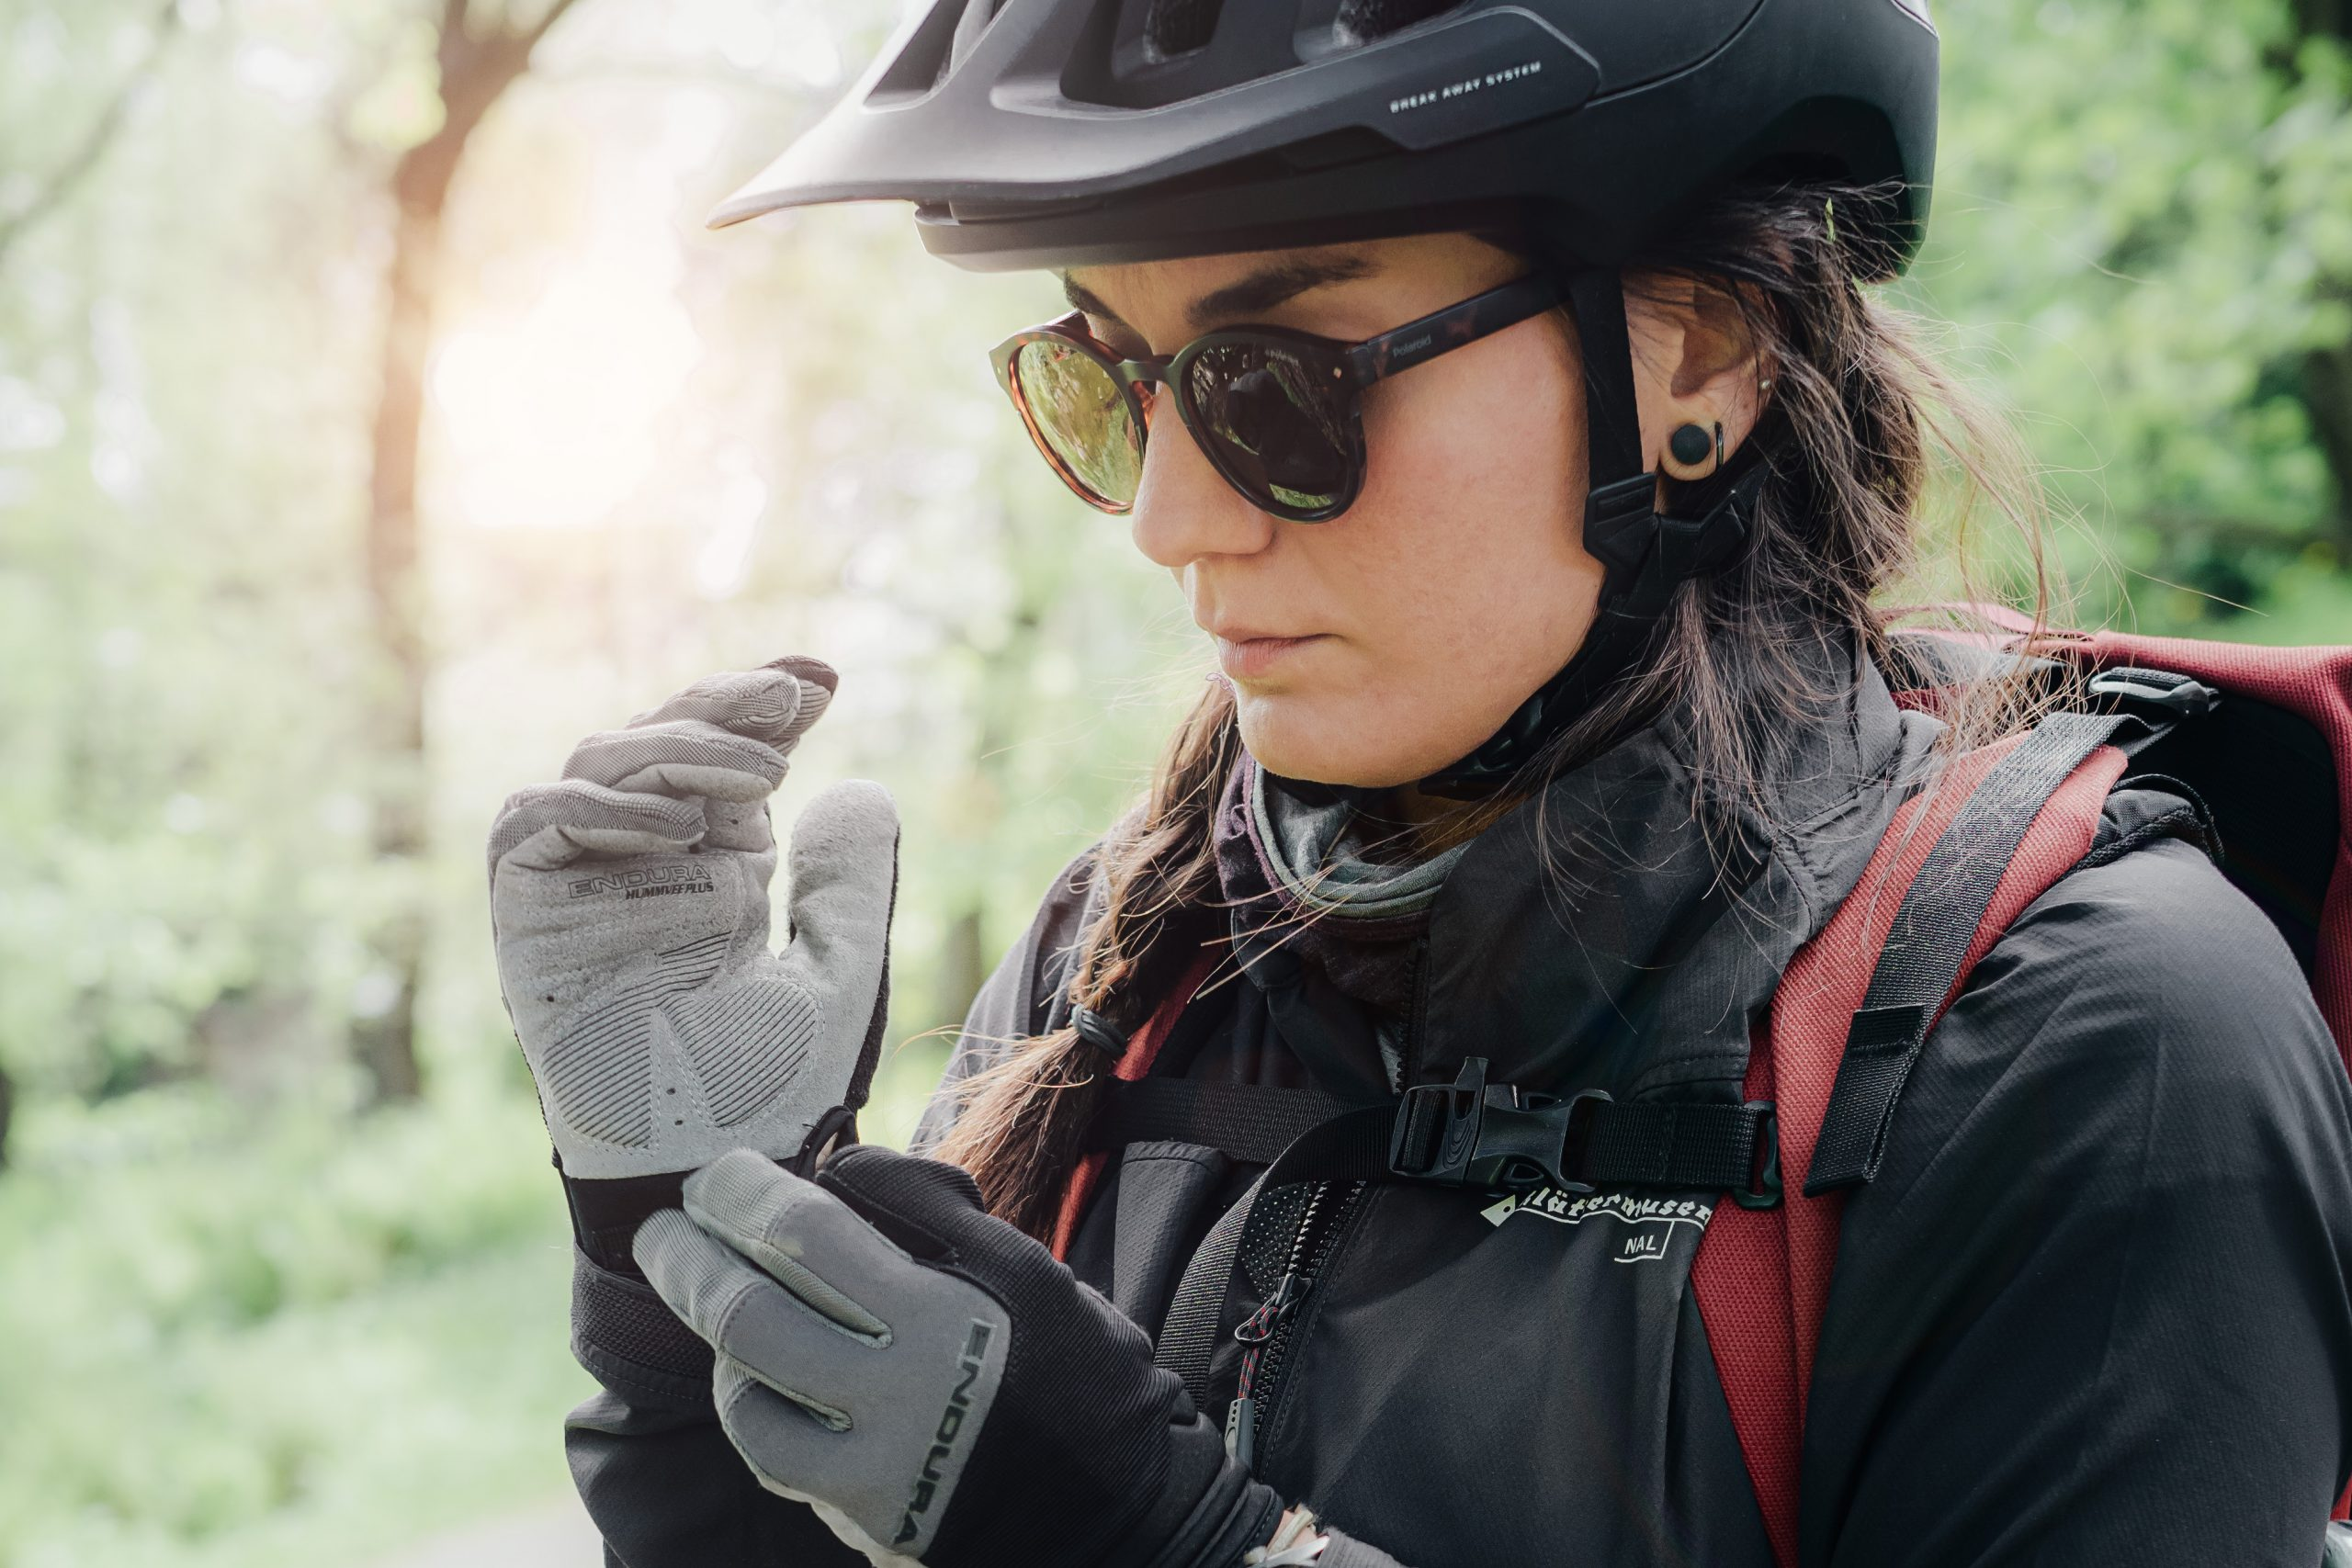 female biker putting gloves on